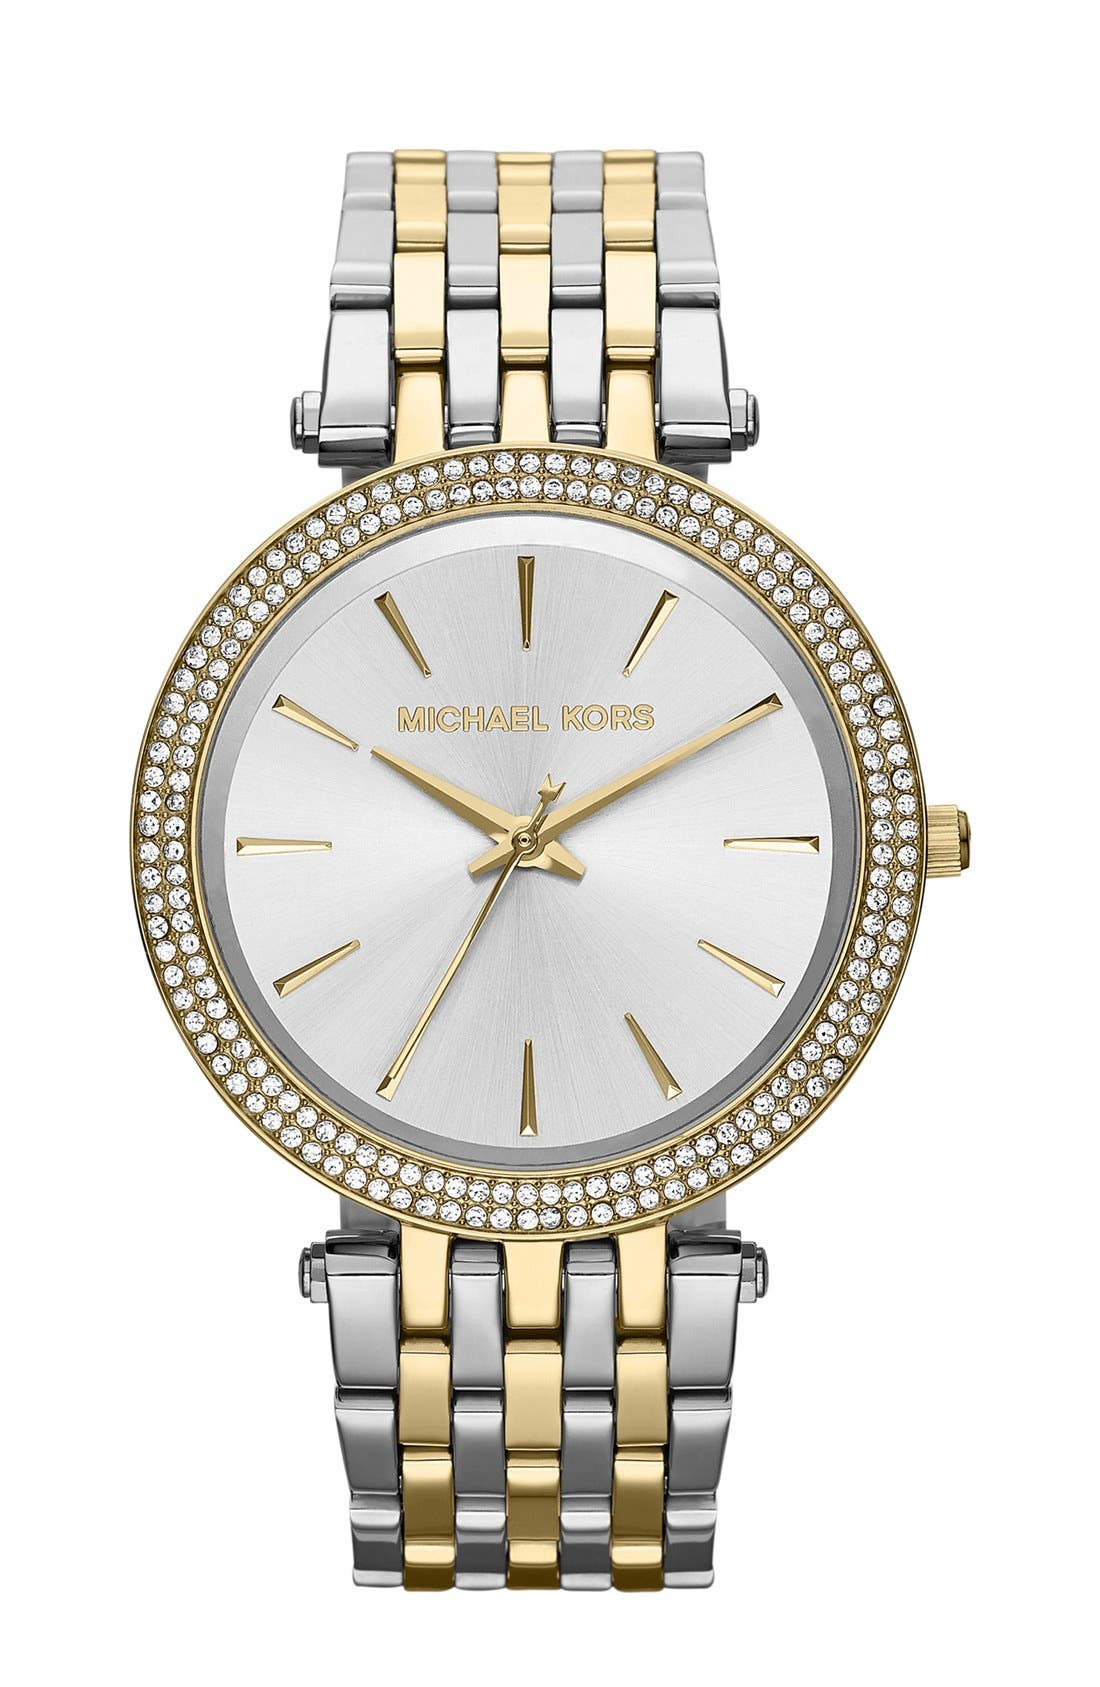 Main Image - Michael Kors 'Darci' Round Bracelet Watch, 39mm